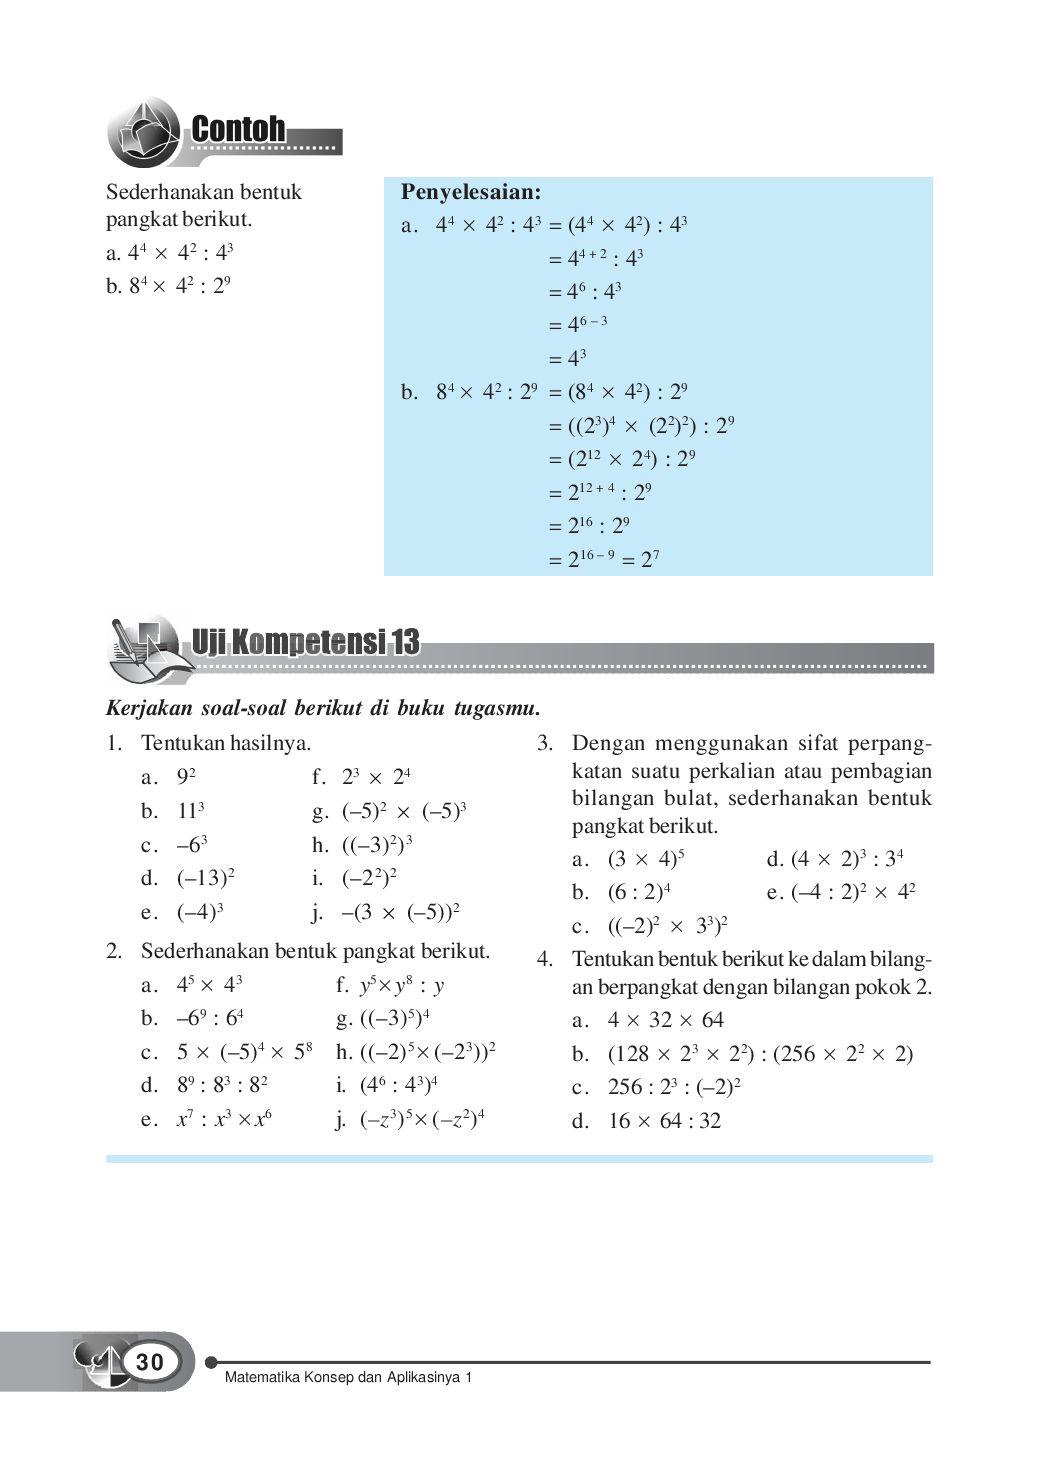 Sederhanakanlah Bentuk Pangkat Berikut : sederhanakanlah, bentuk, pangkat, berikut, Kelas01_matematika-konsep-dan-aplikasinya_dewi-tri, Selagan, Issuu